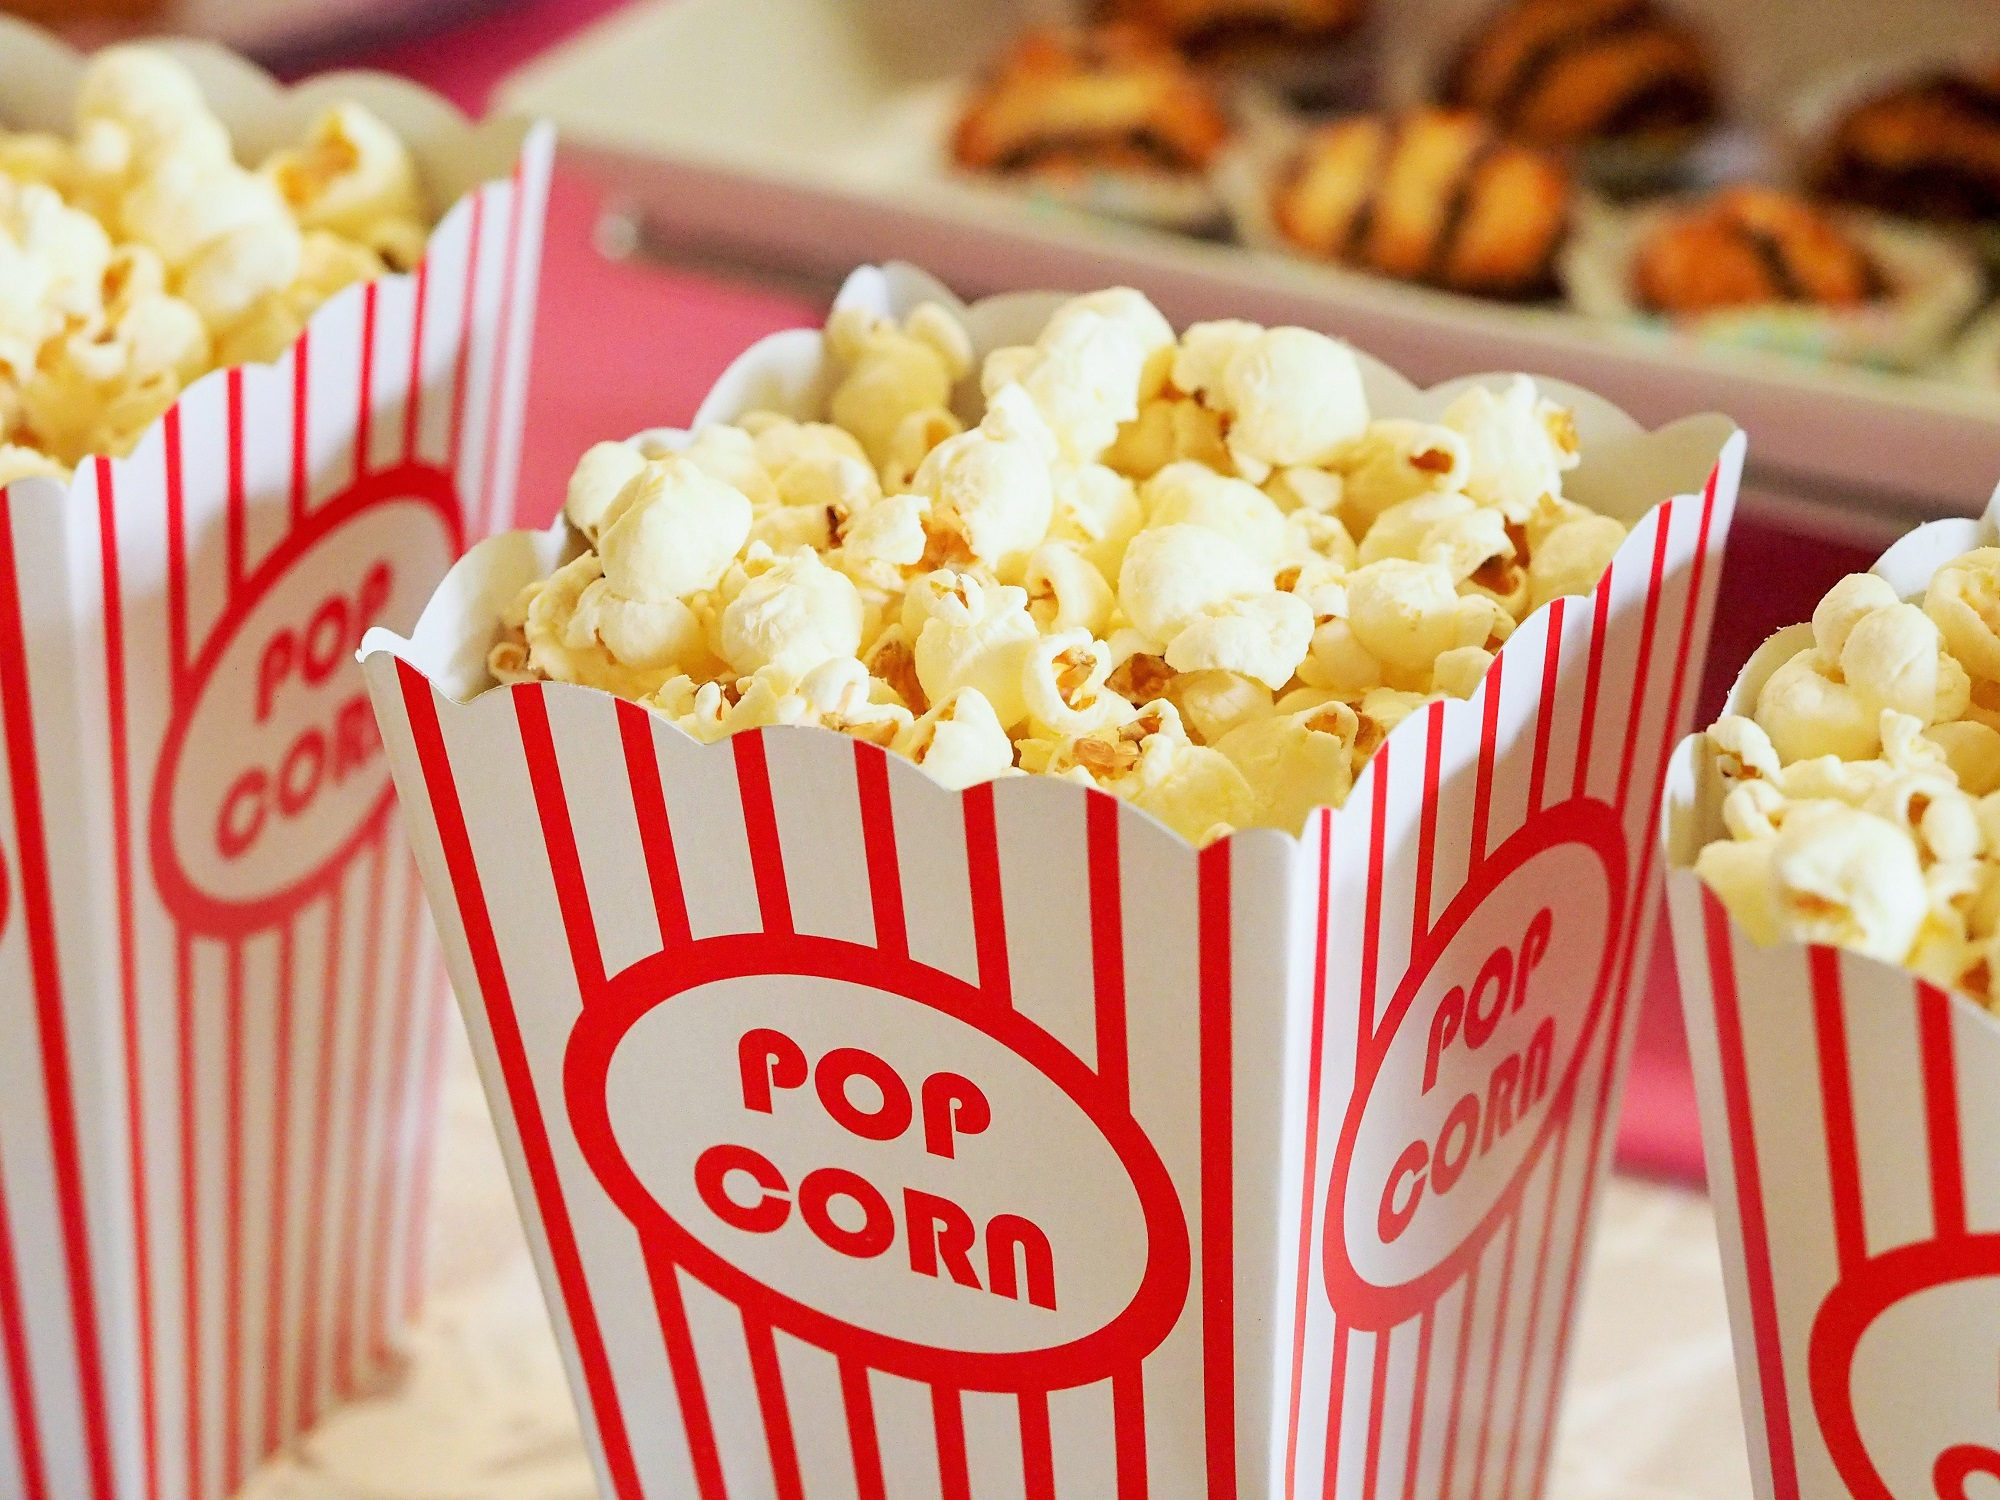 food-snack-popcorn-movie-theater-pixabay.jpg